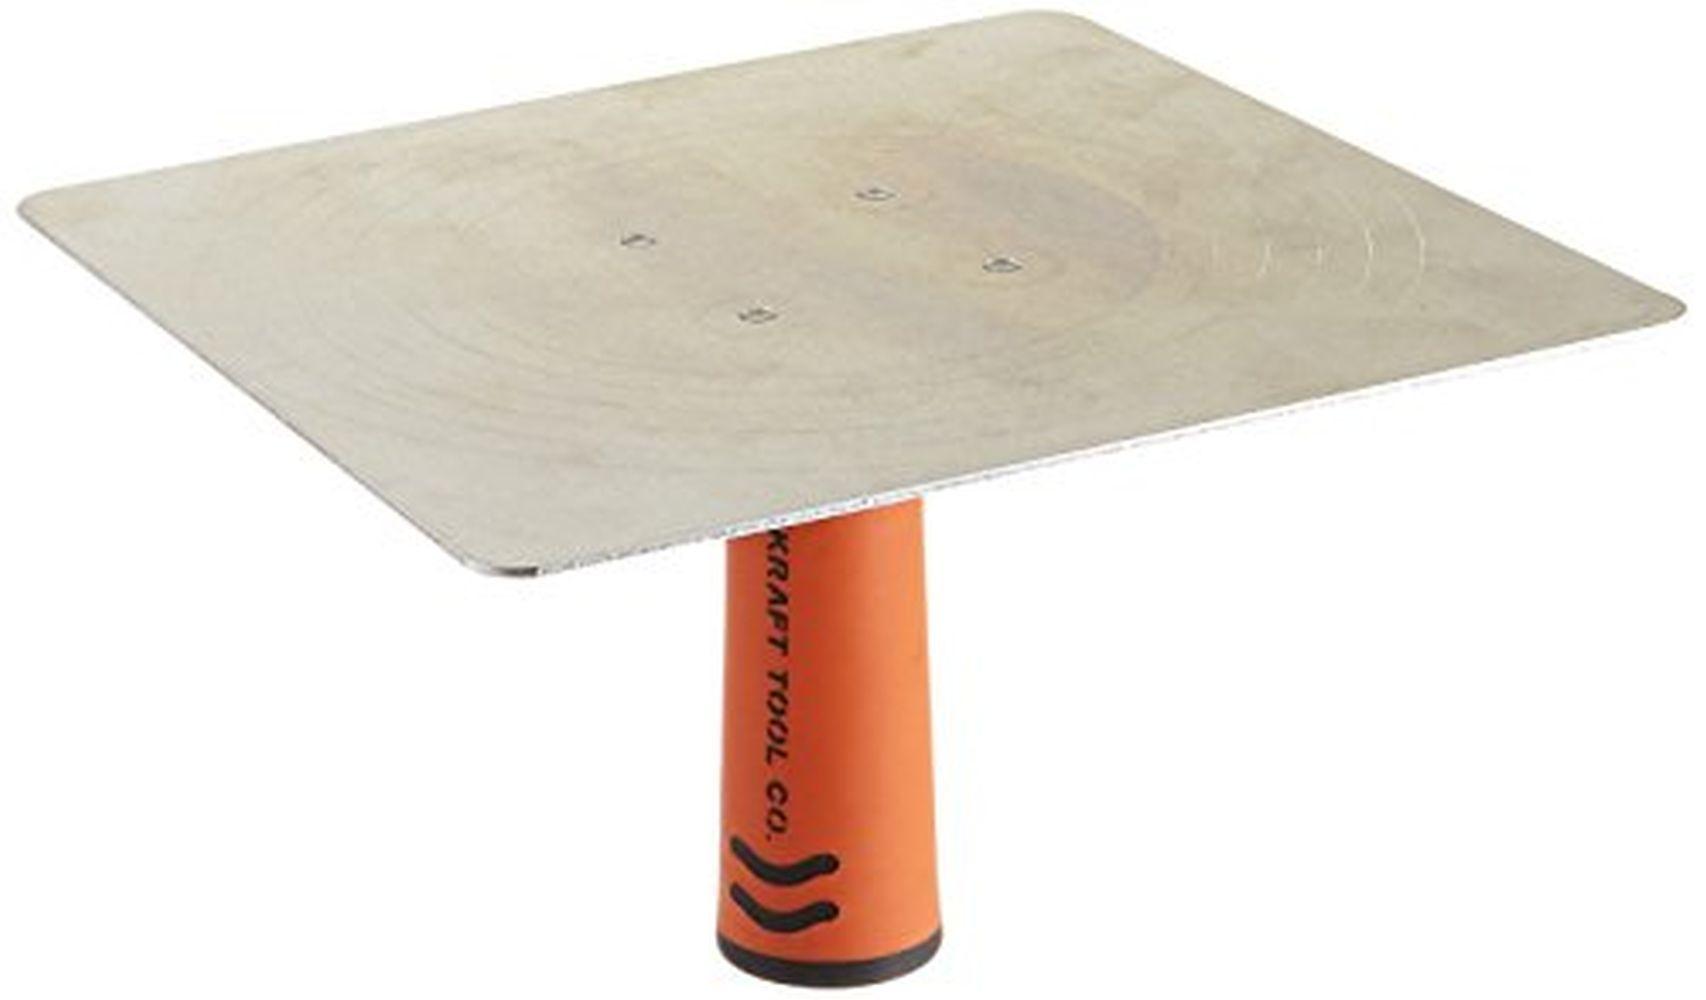 10 x 10-Inch 10 x 10-Inch Kraft Tool PL261PF Magnesium Hawk with ProForm Soft Grip Handle